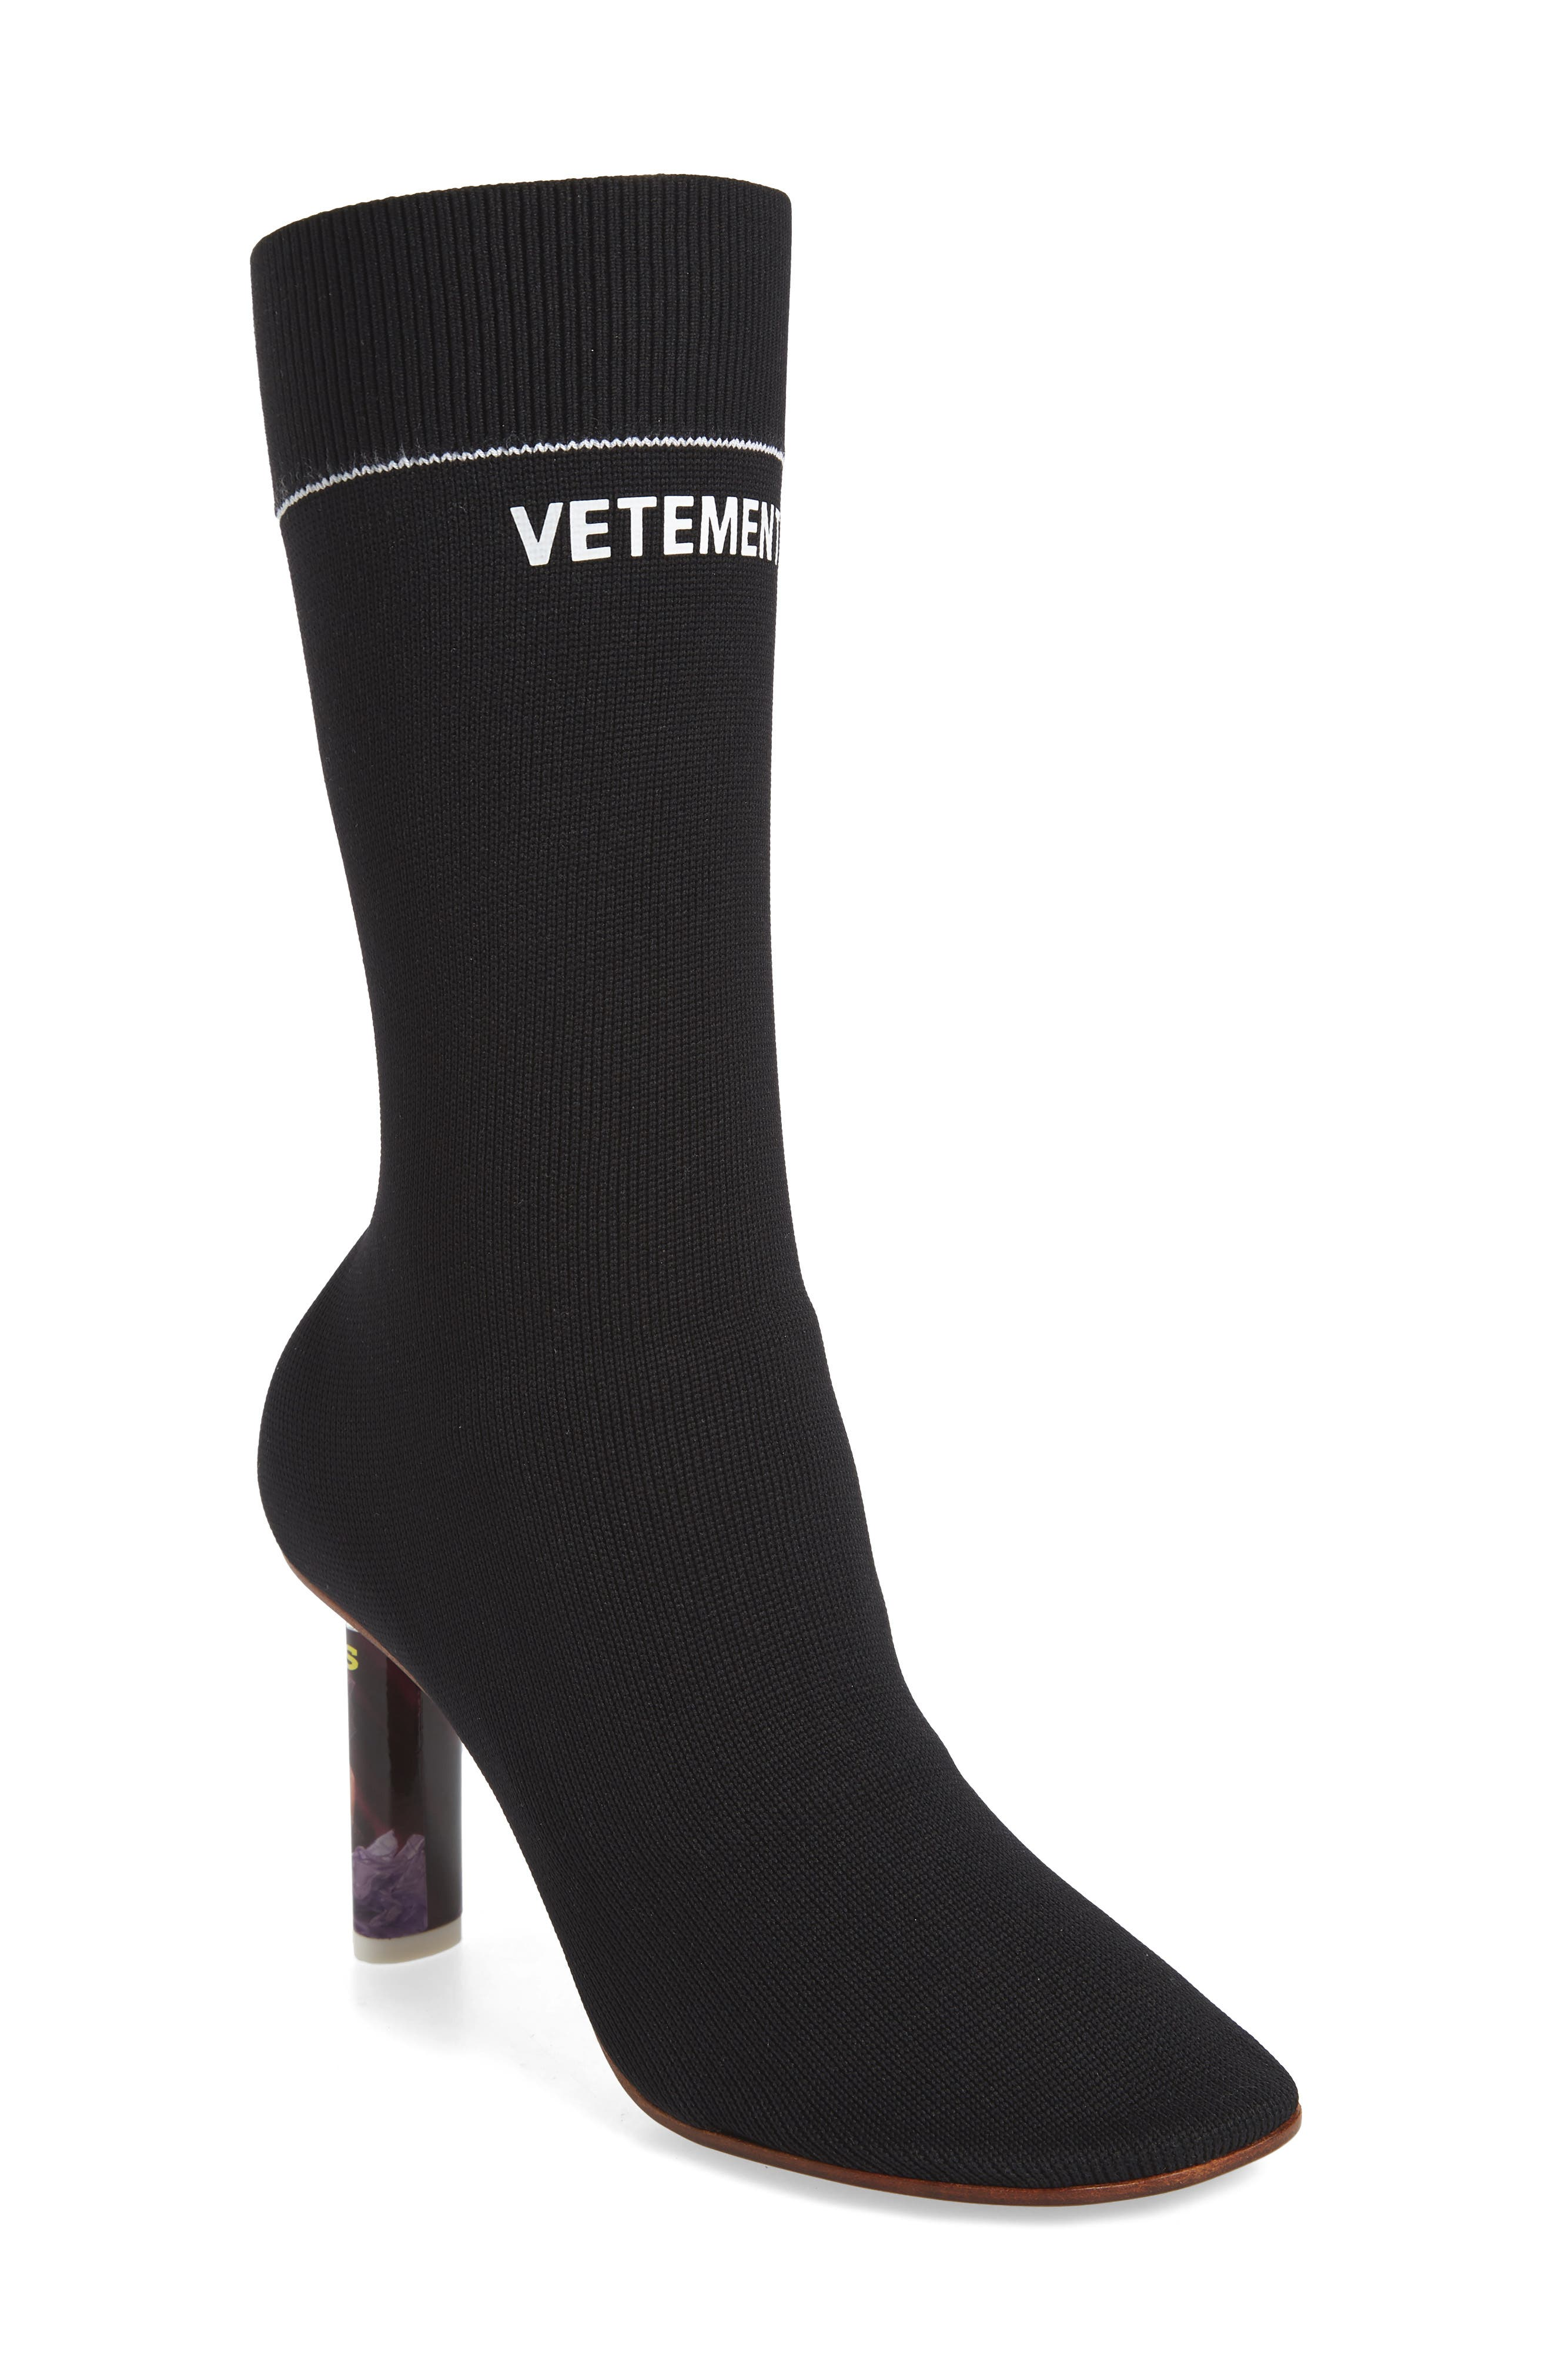 Lighter Sock Boot,                             Main thumbnail 1, color,                             BLACK/PRINTED HEEL